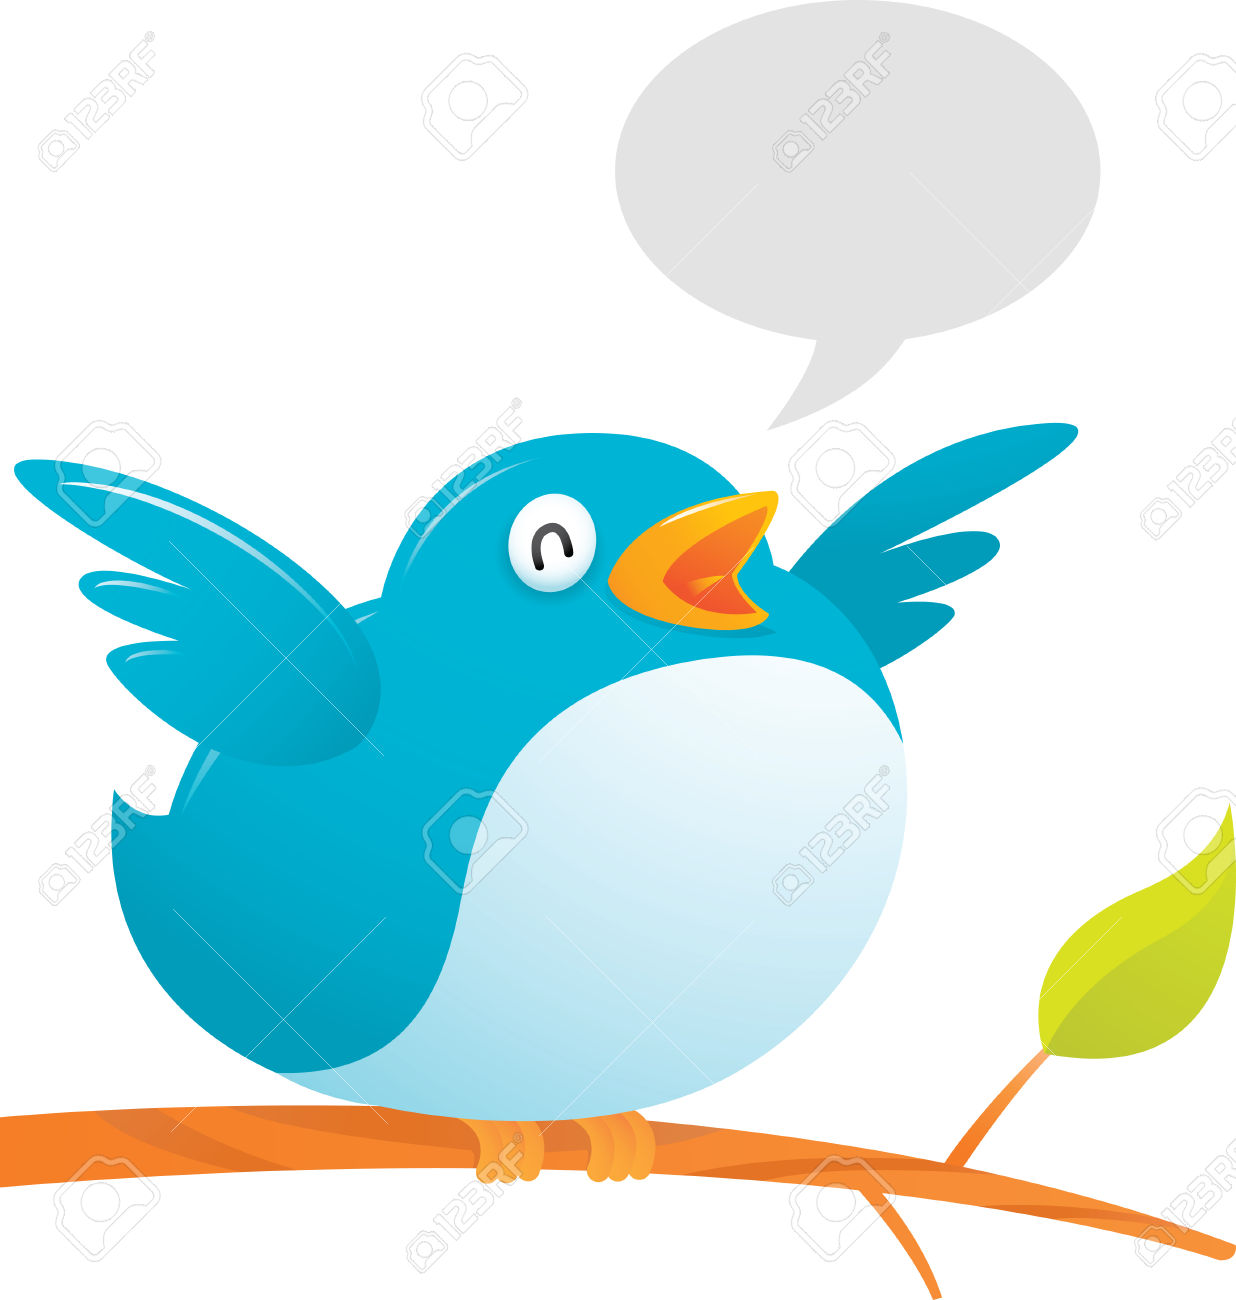 Twitter bird clipart free Illustration Of Fat Twitter Bird On Tree Royalty Free Cliparts ... free